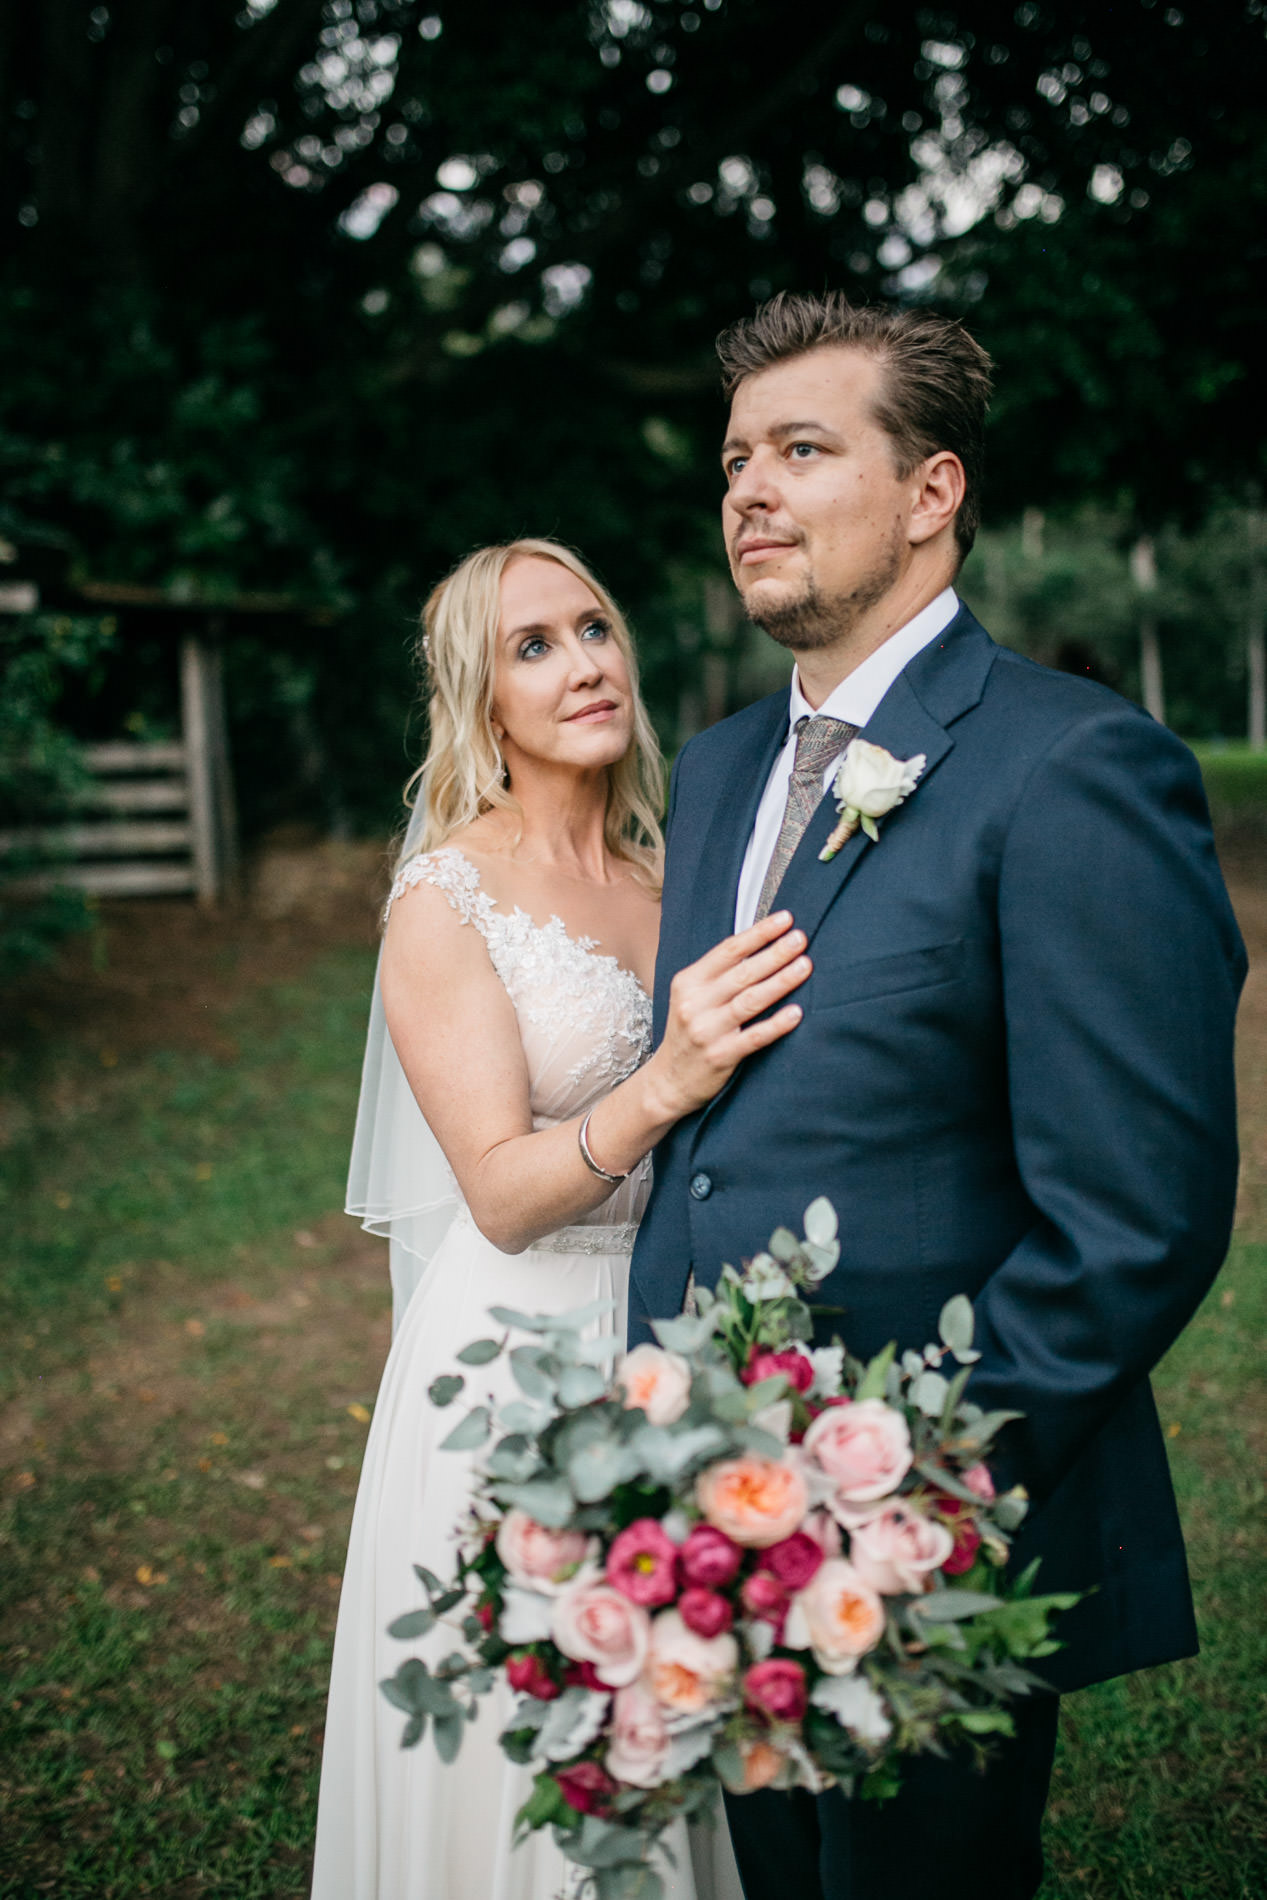 True North Photography_Boomerang Farm_Stacey and Isaac_Gold Coast Wedding_Barm Wedding_Hinterland Wedding-162.jpg